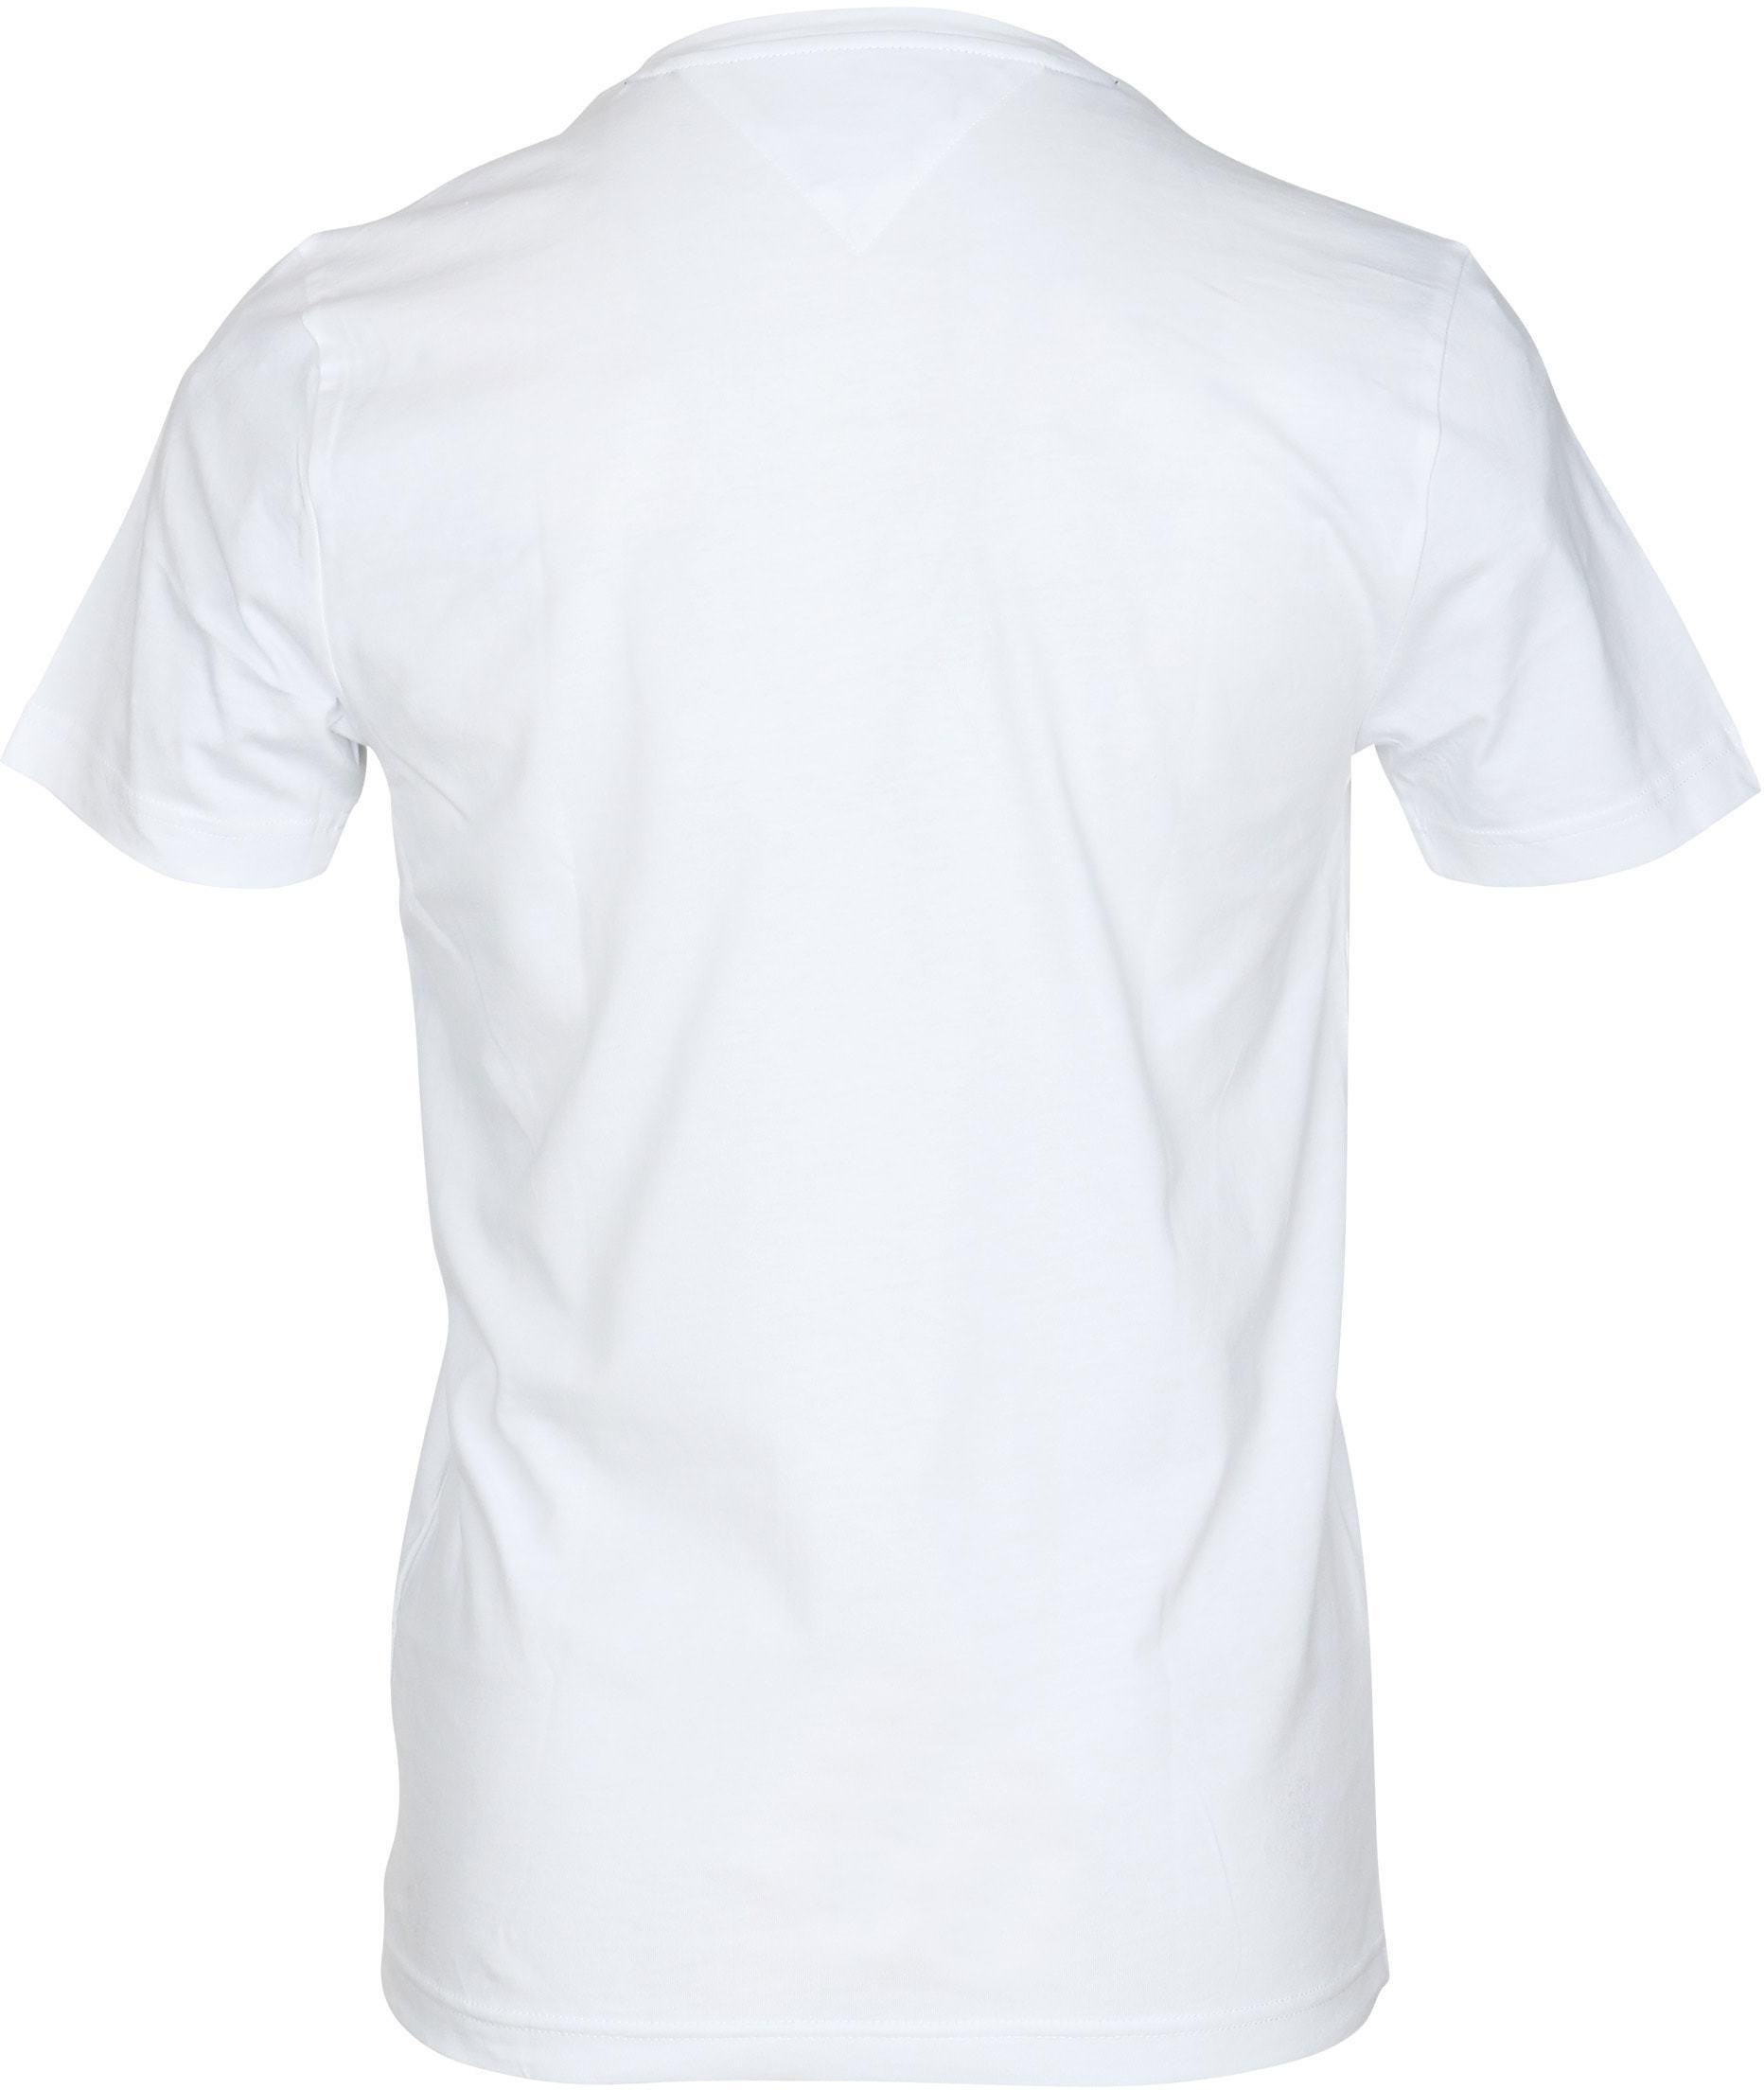 Tommy Hilfiger T-shirt Wit foto 3